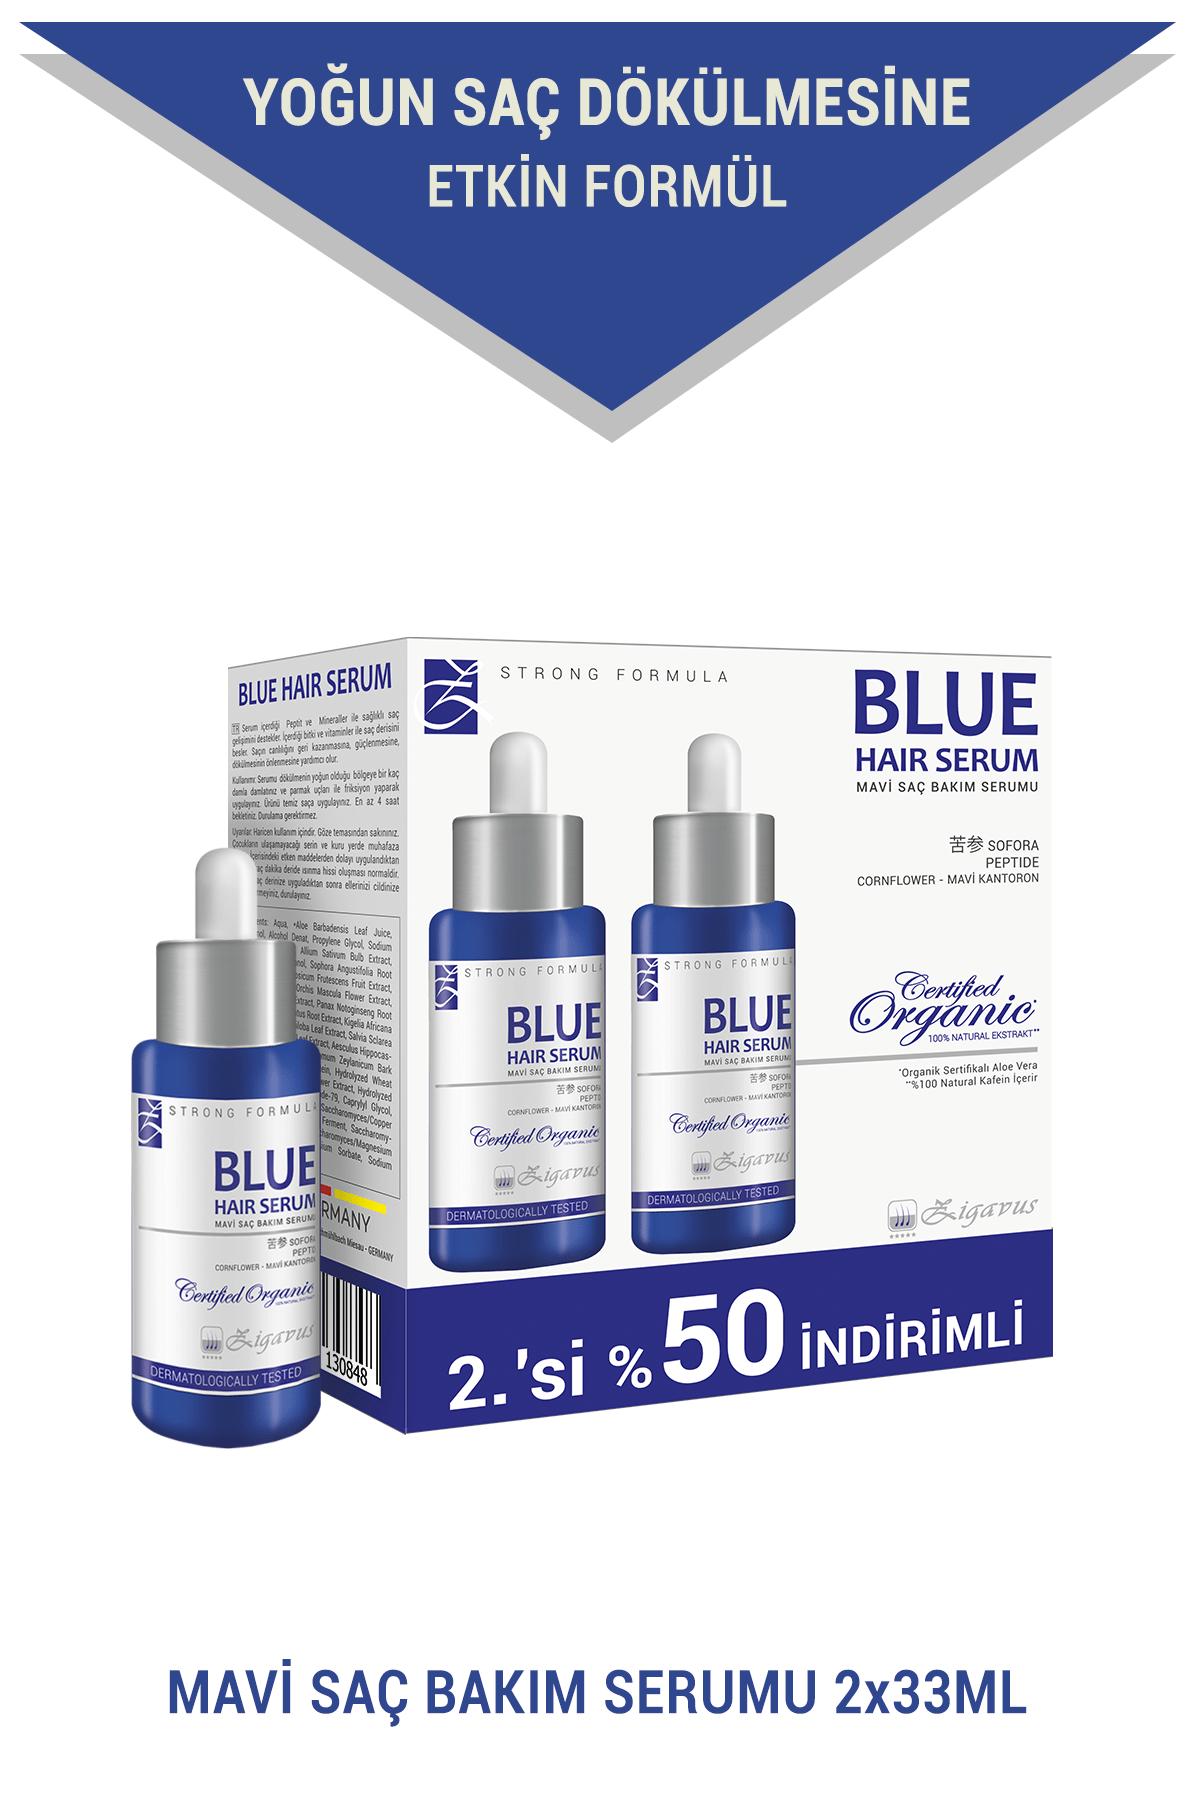 Zigavus Blue Saç Bakım Serumu 2x33 ml (2.si%50 İndirimli) - Mavi Su 8699349130848